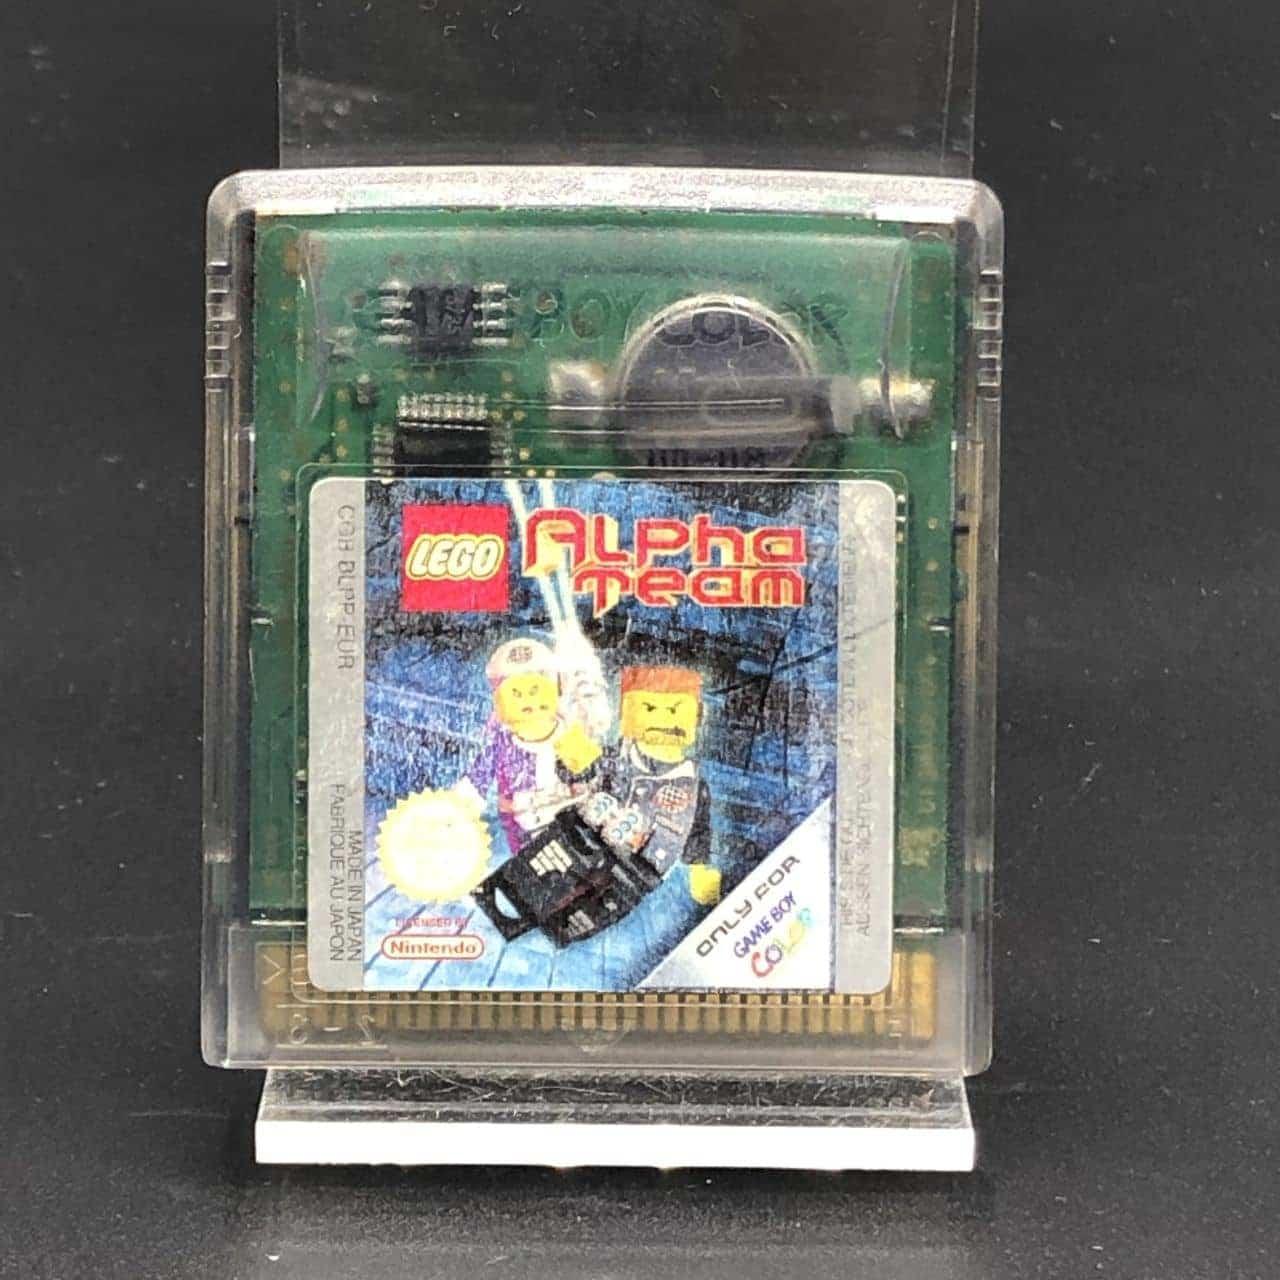 GBC Lego Alpha Team (Modul) (Gebrauchsspuren) Nintendo Game Boy Color